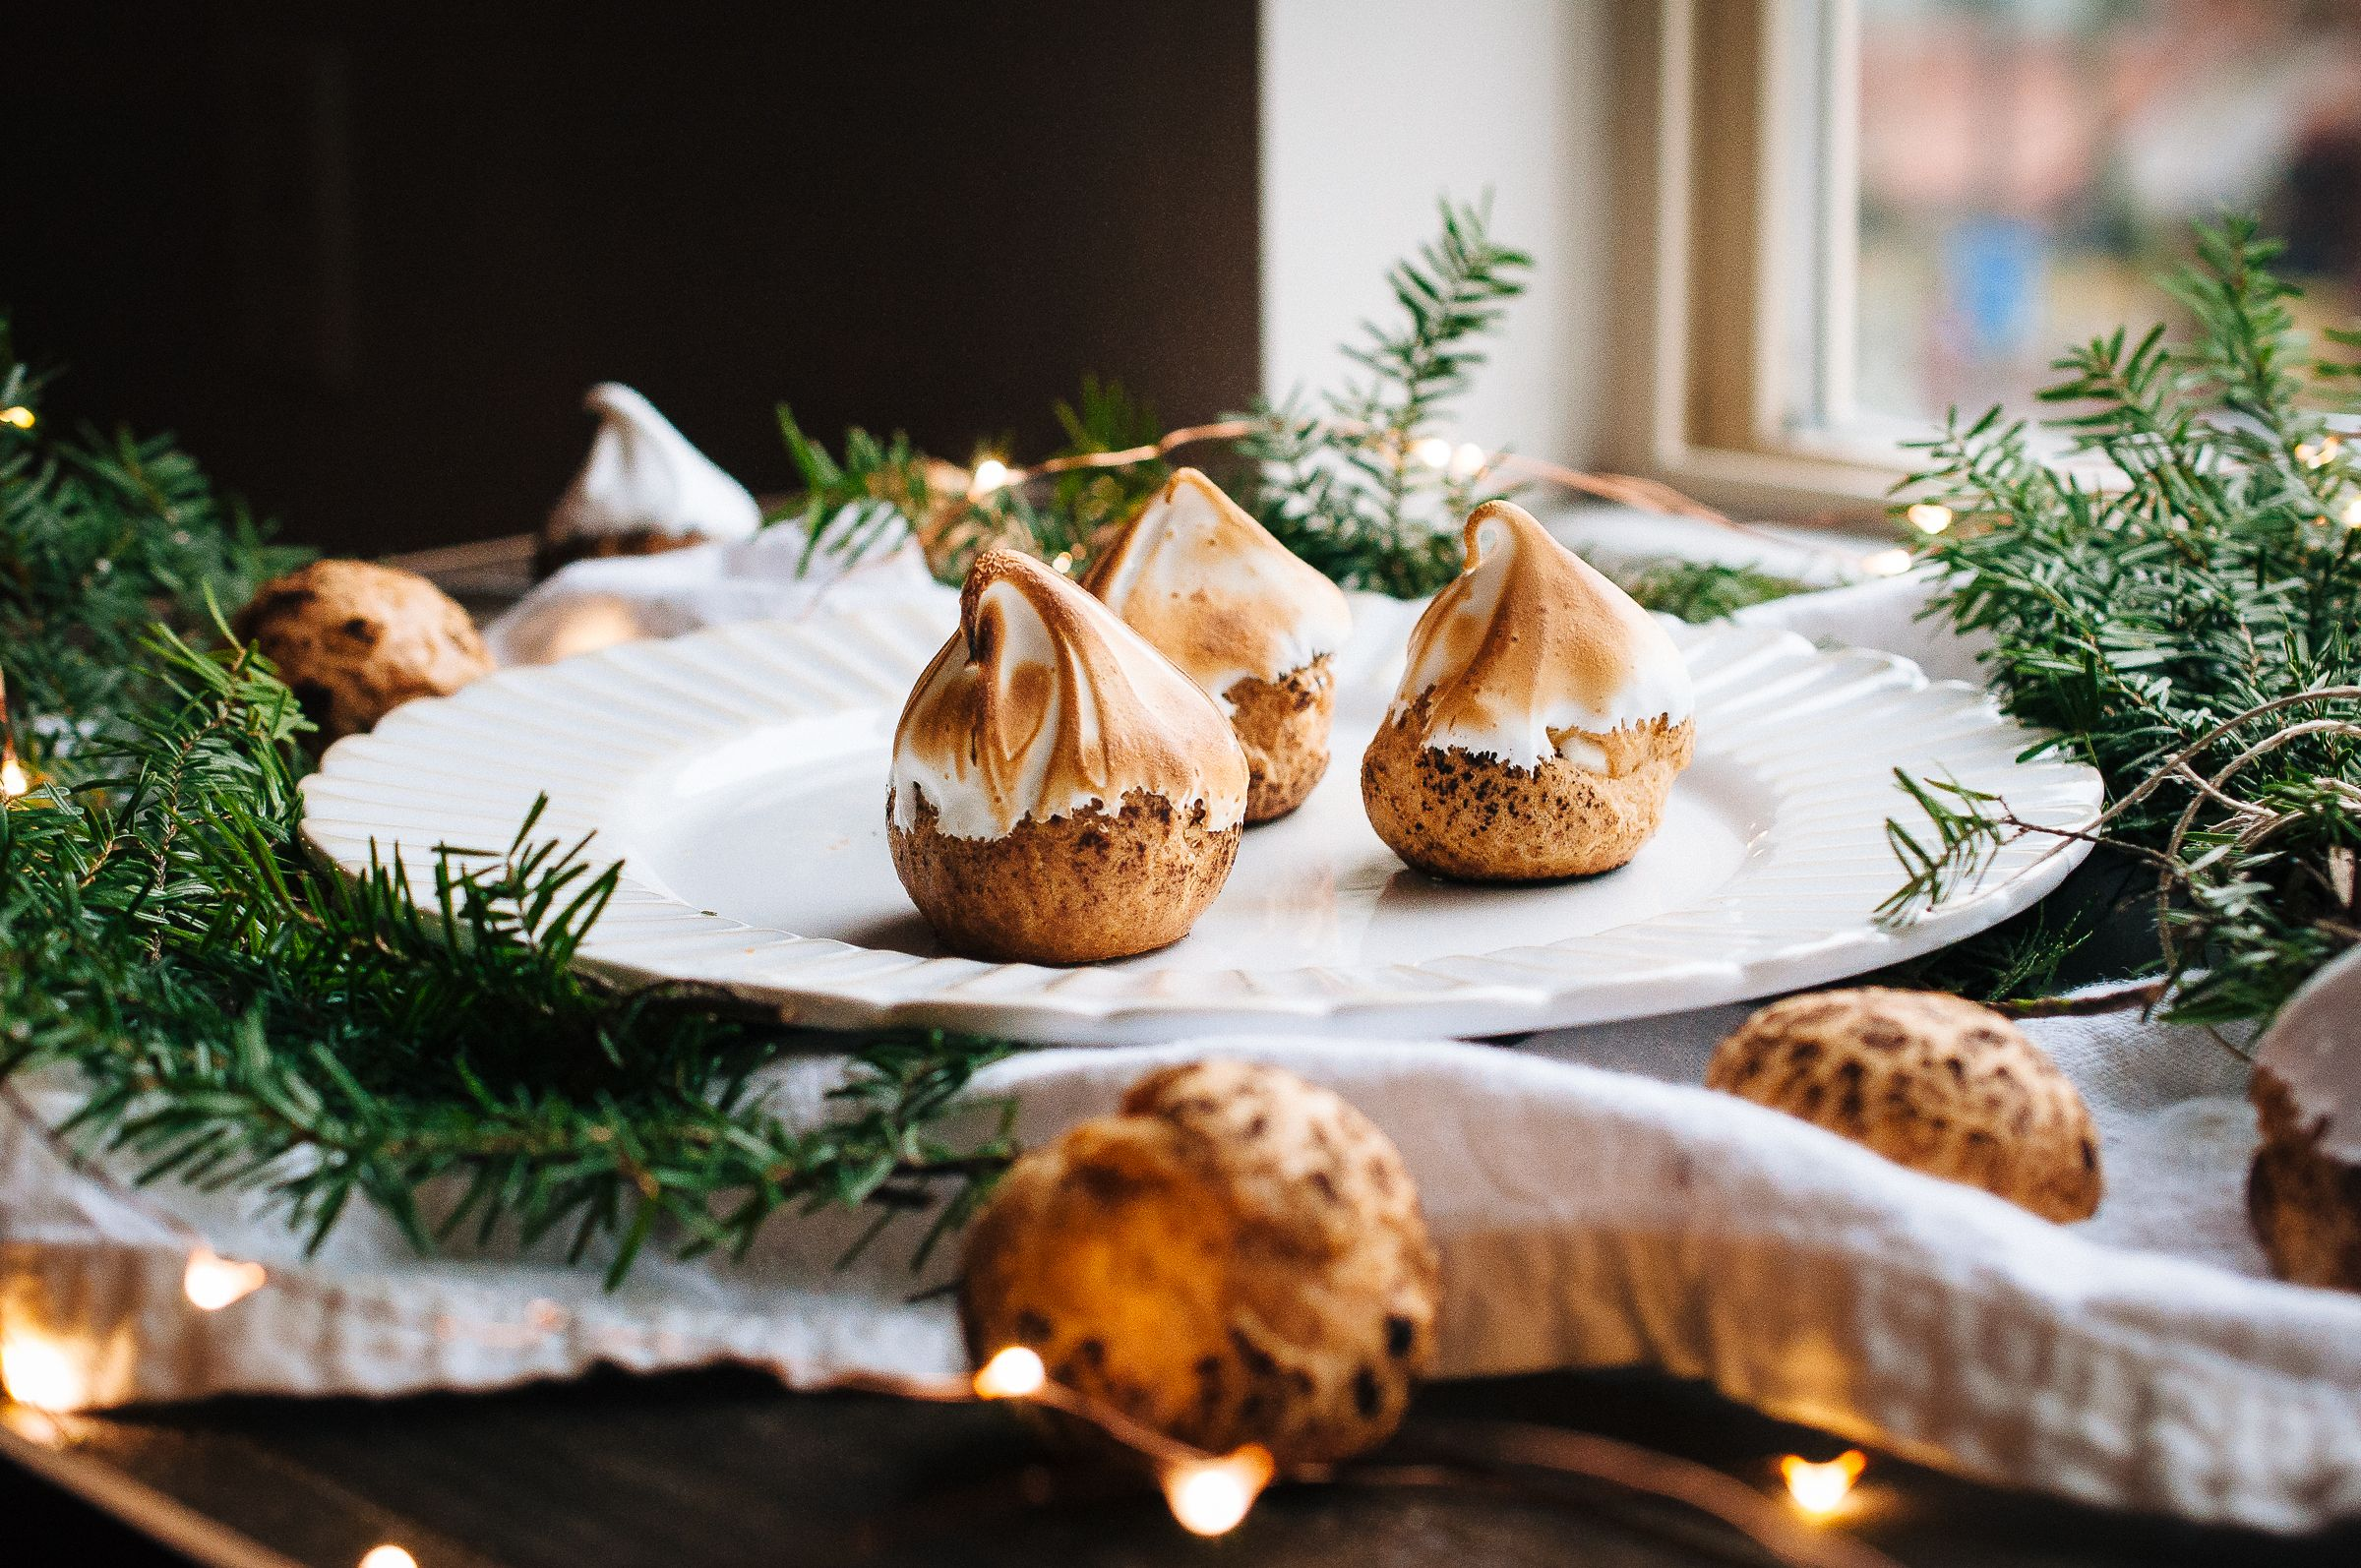 20 Best Holiday Desserts To Sweeten The Season